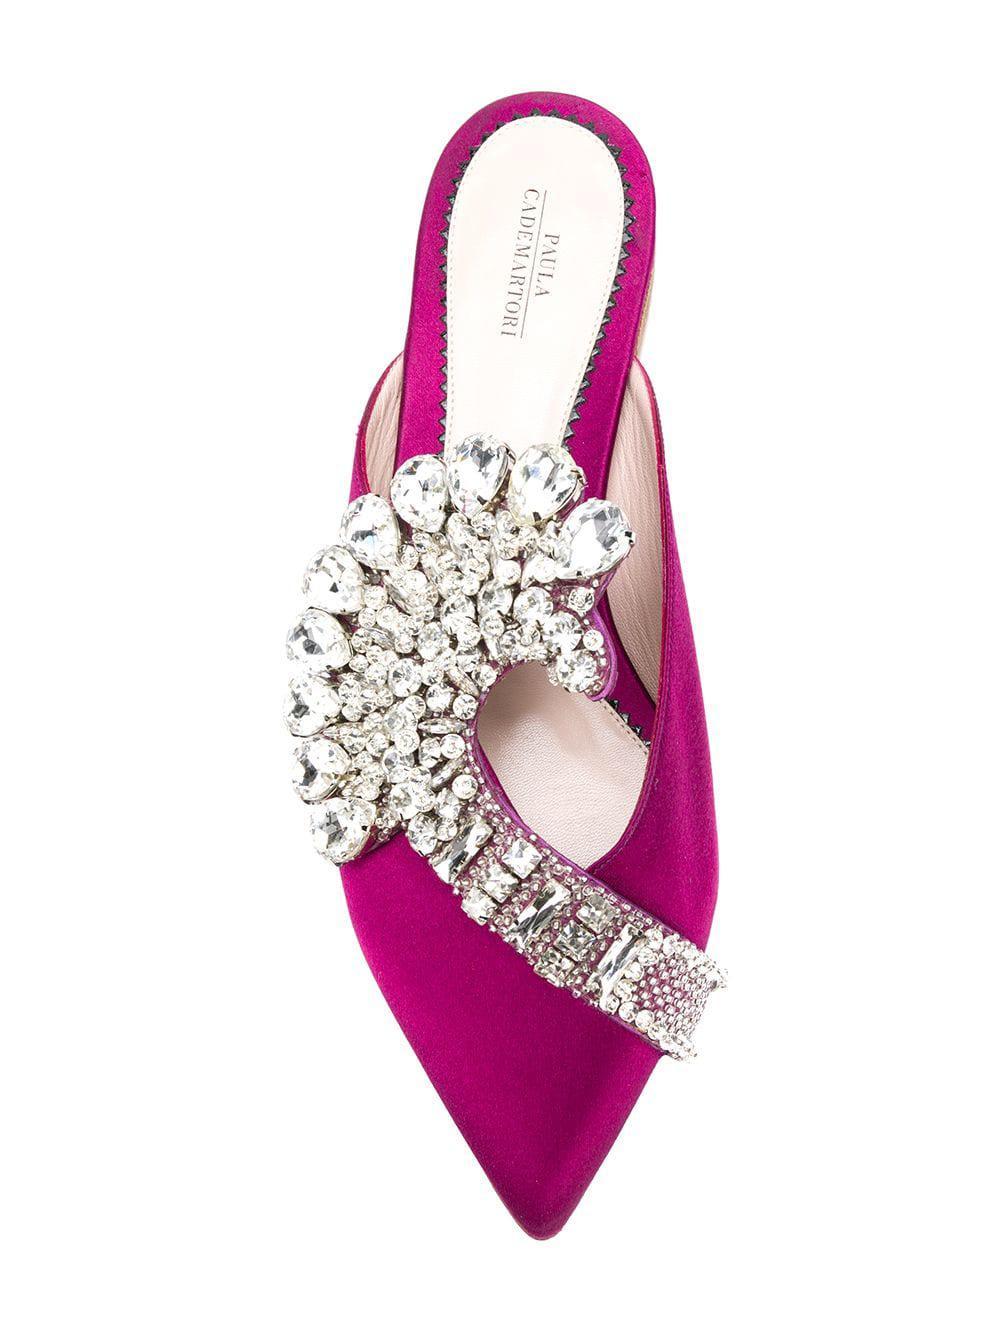 Opulence Lyst Paula Cademartori Flower Pink In qYStYAw